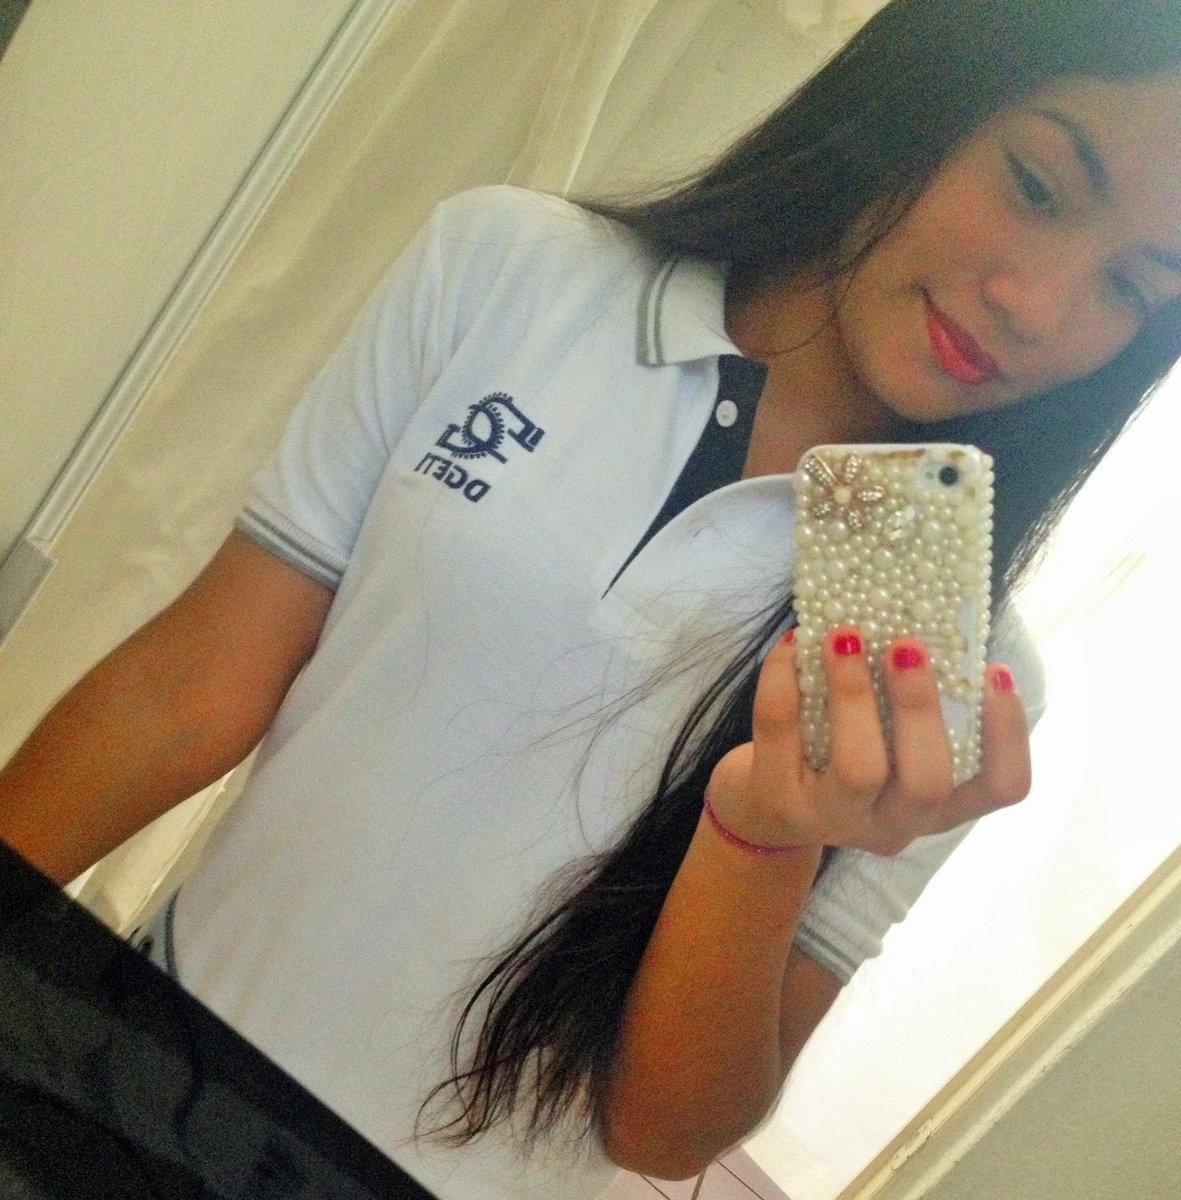 Amateur Adolescente Fotos Porno packs teens (@packsmegafull) | twitter